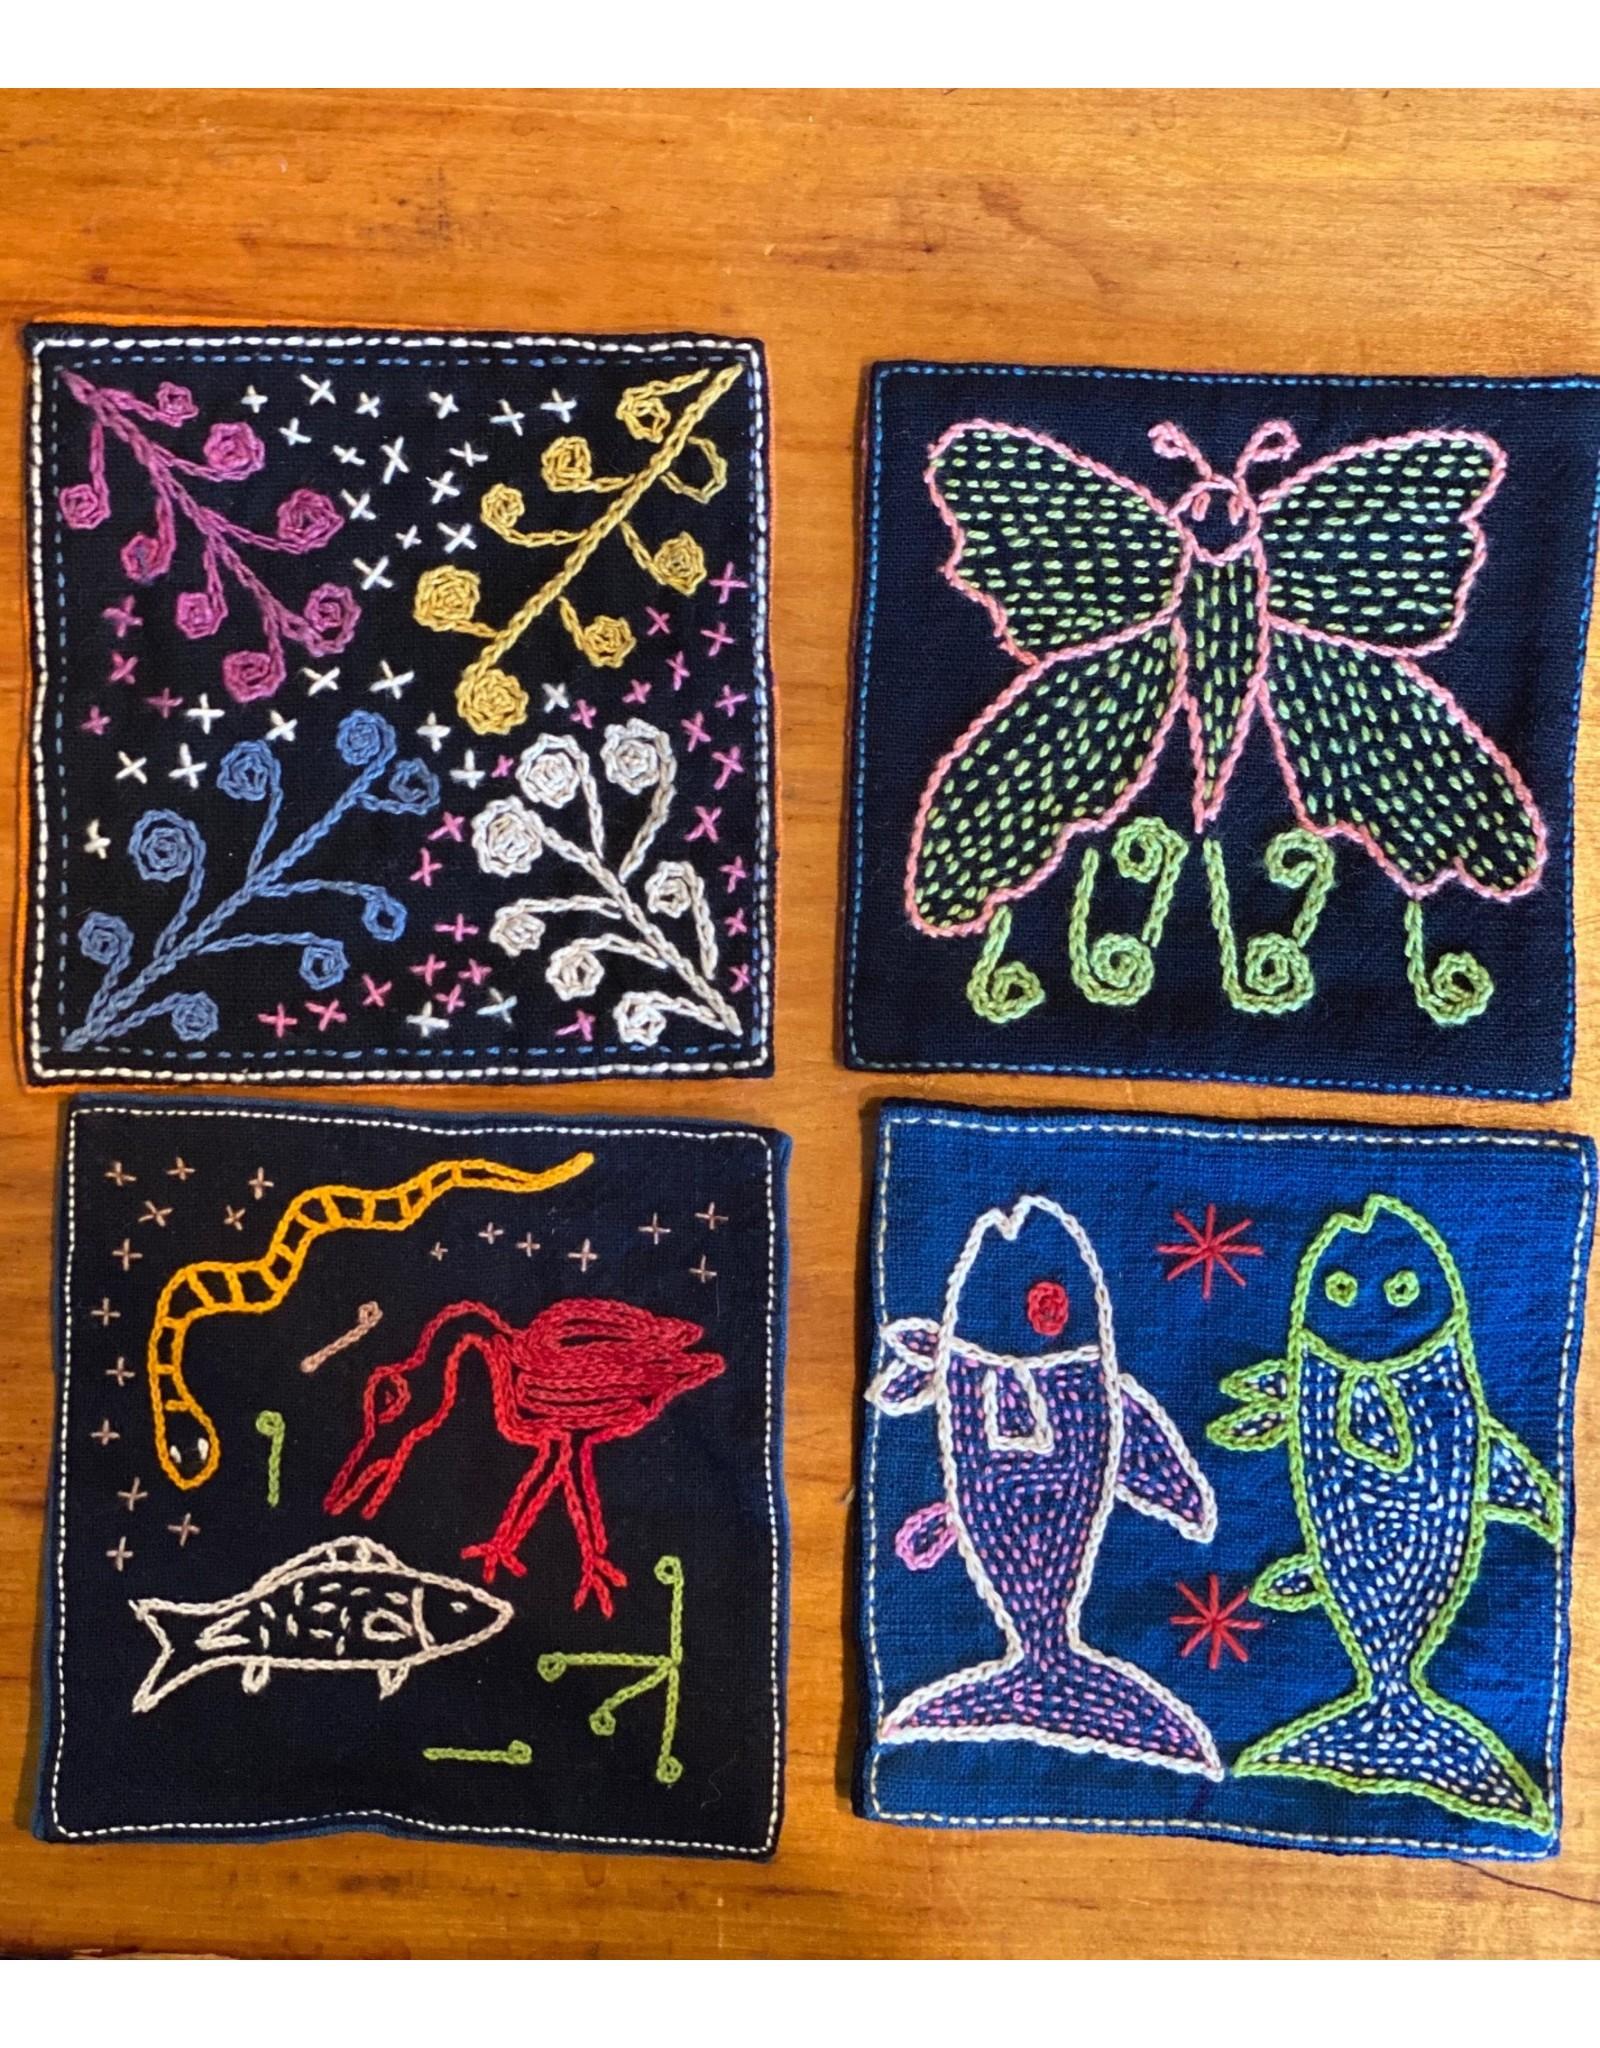 Individual Embroidered Coasters, Laos